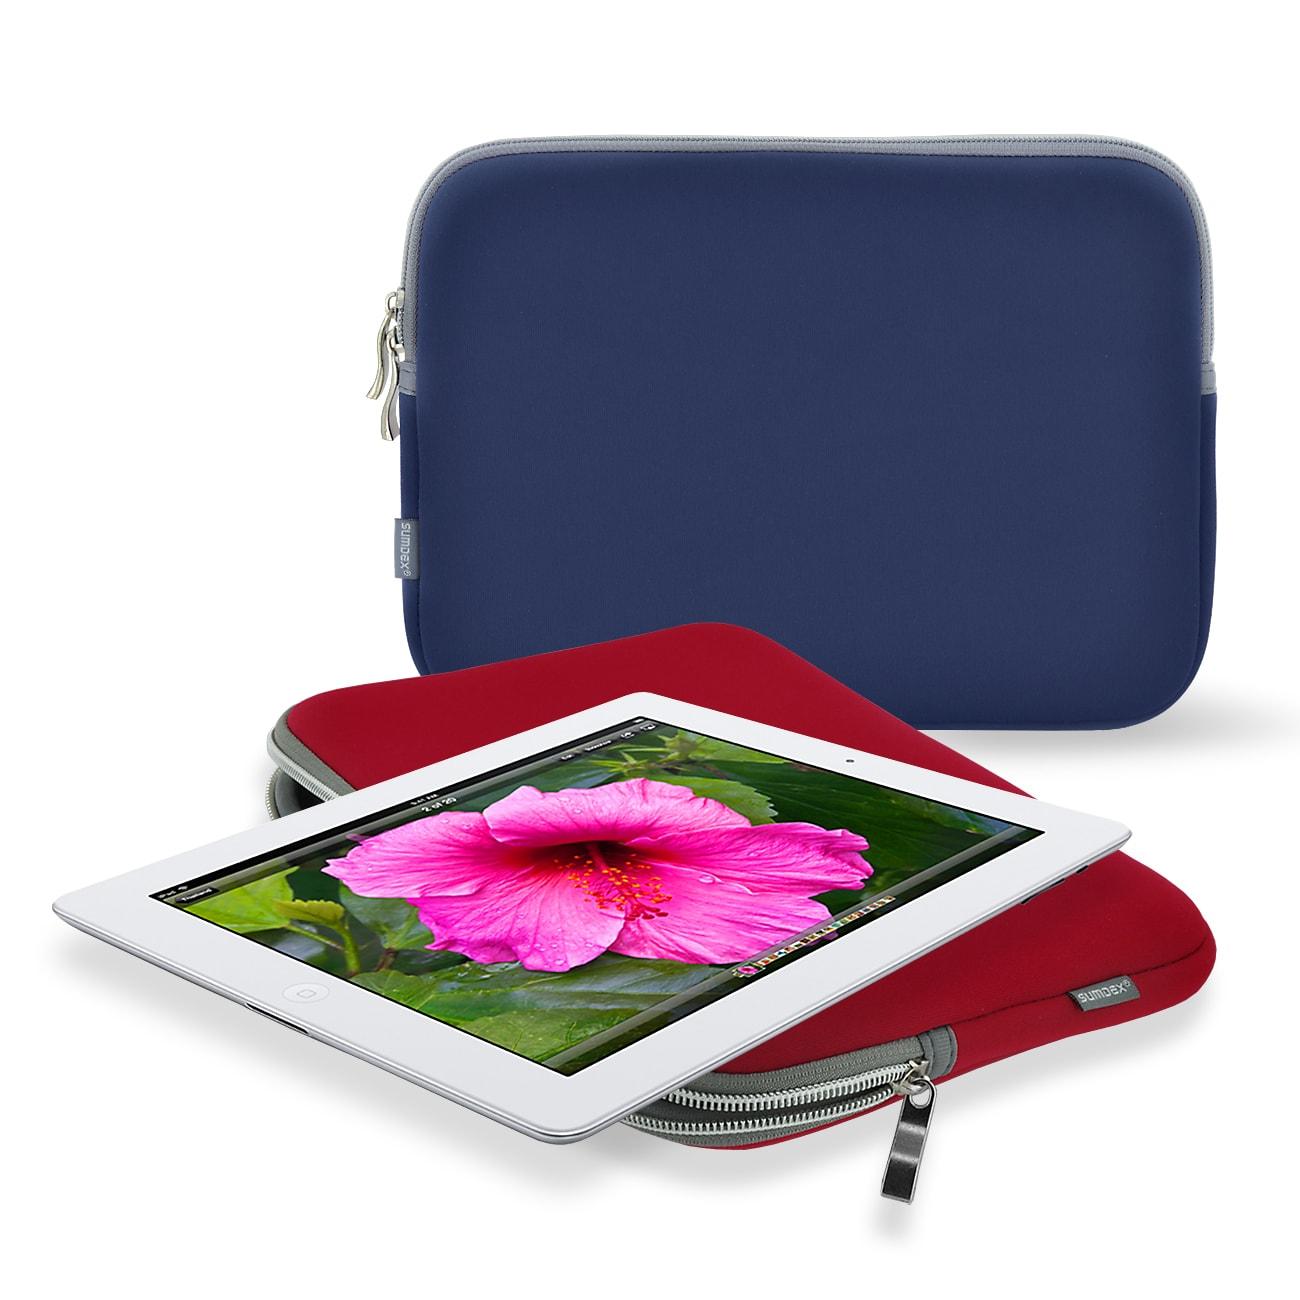 Sumdex NUN-010 10.2-inch Neoprene Insert Zipper Sleeve for iPad 2 Tablets